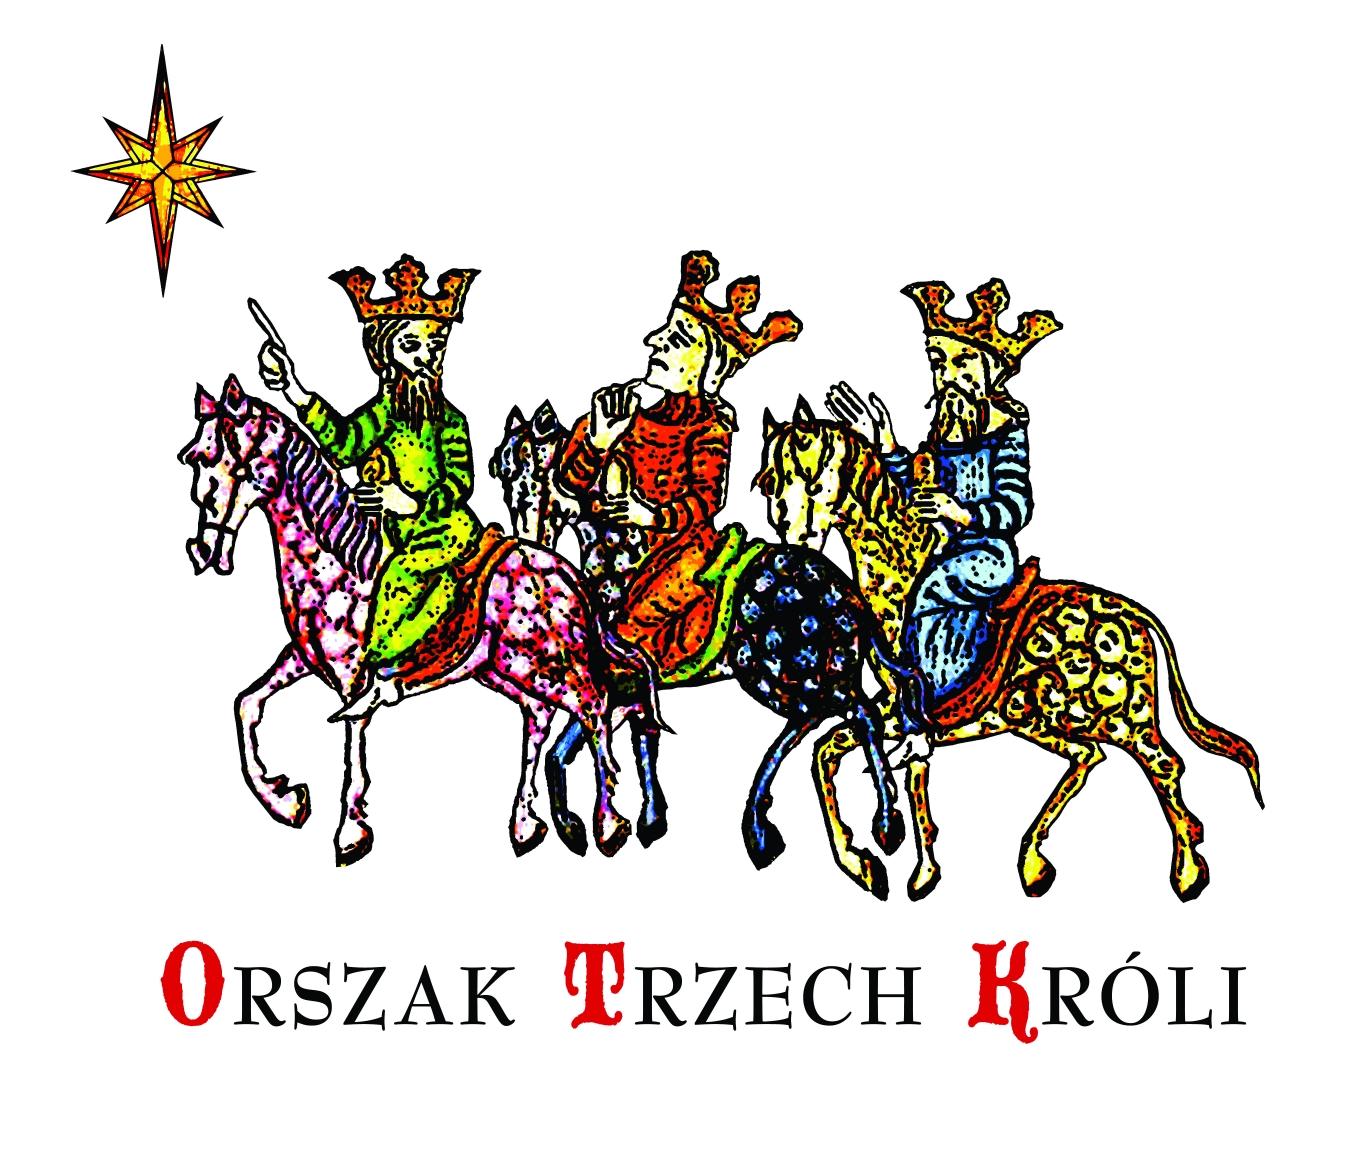 http://zssamsonow.szkolnastrona.pl/container/01174104_logo_orszak__srednia_jakosc.jpg